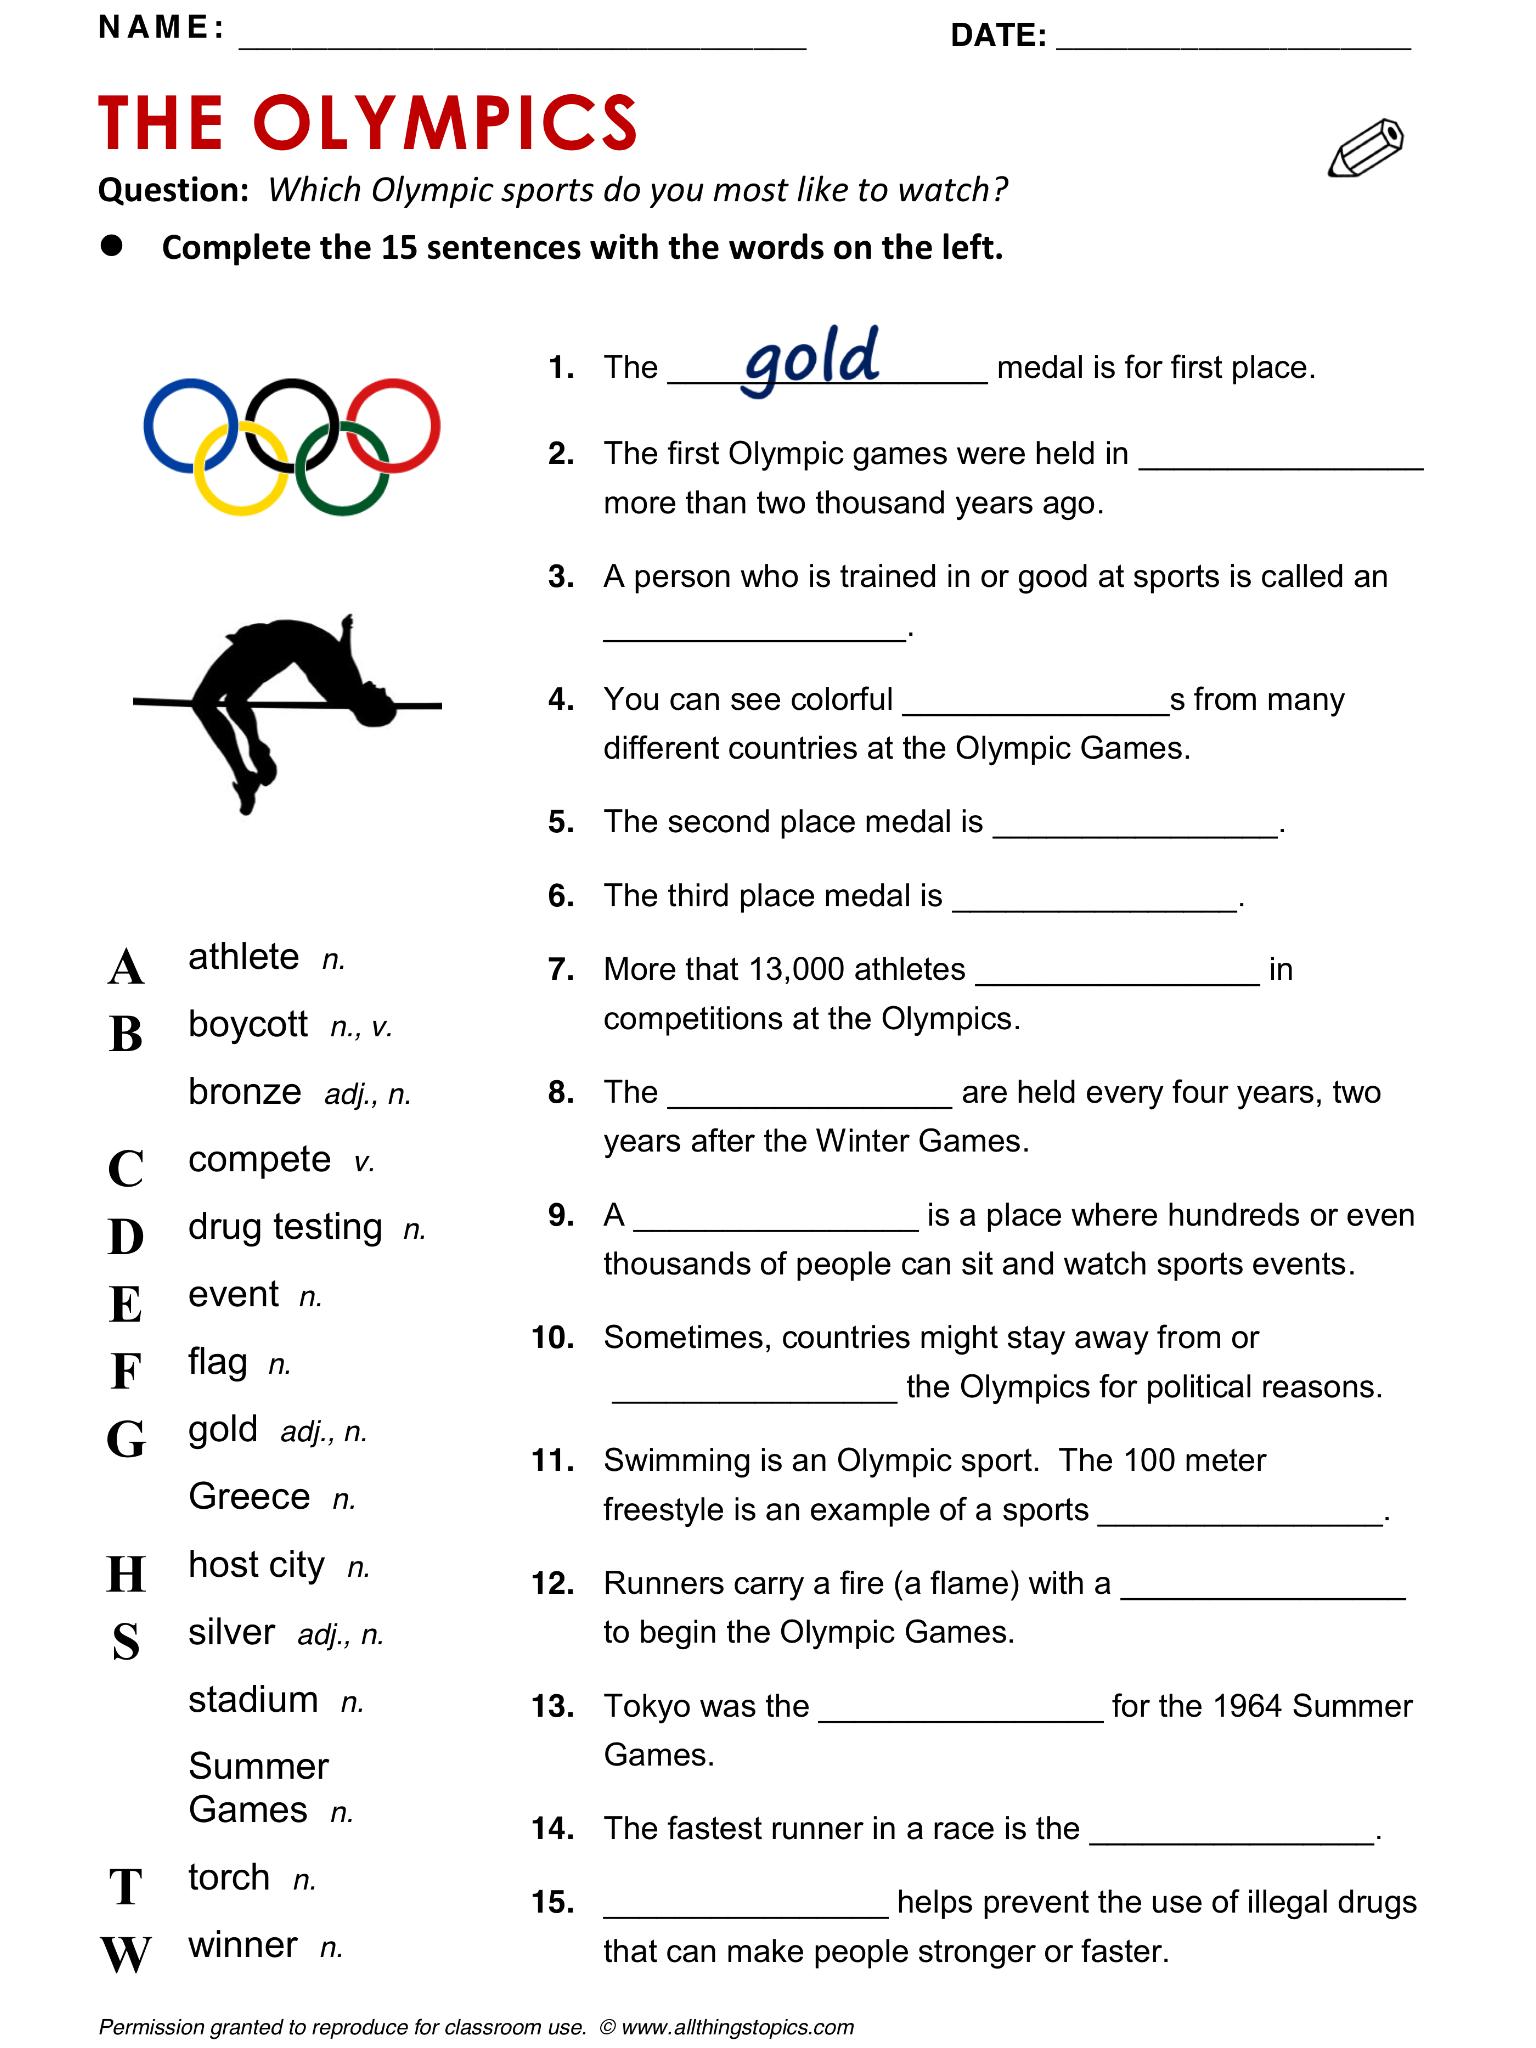 worksheet Learning English Worksheets olympics english learning vocabulary esl phrases http